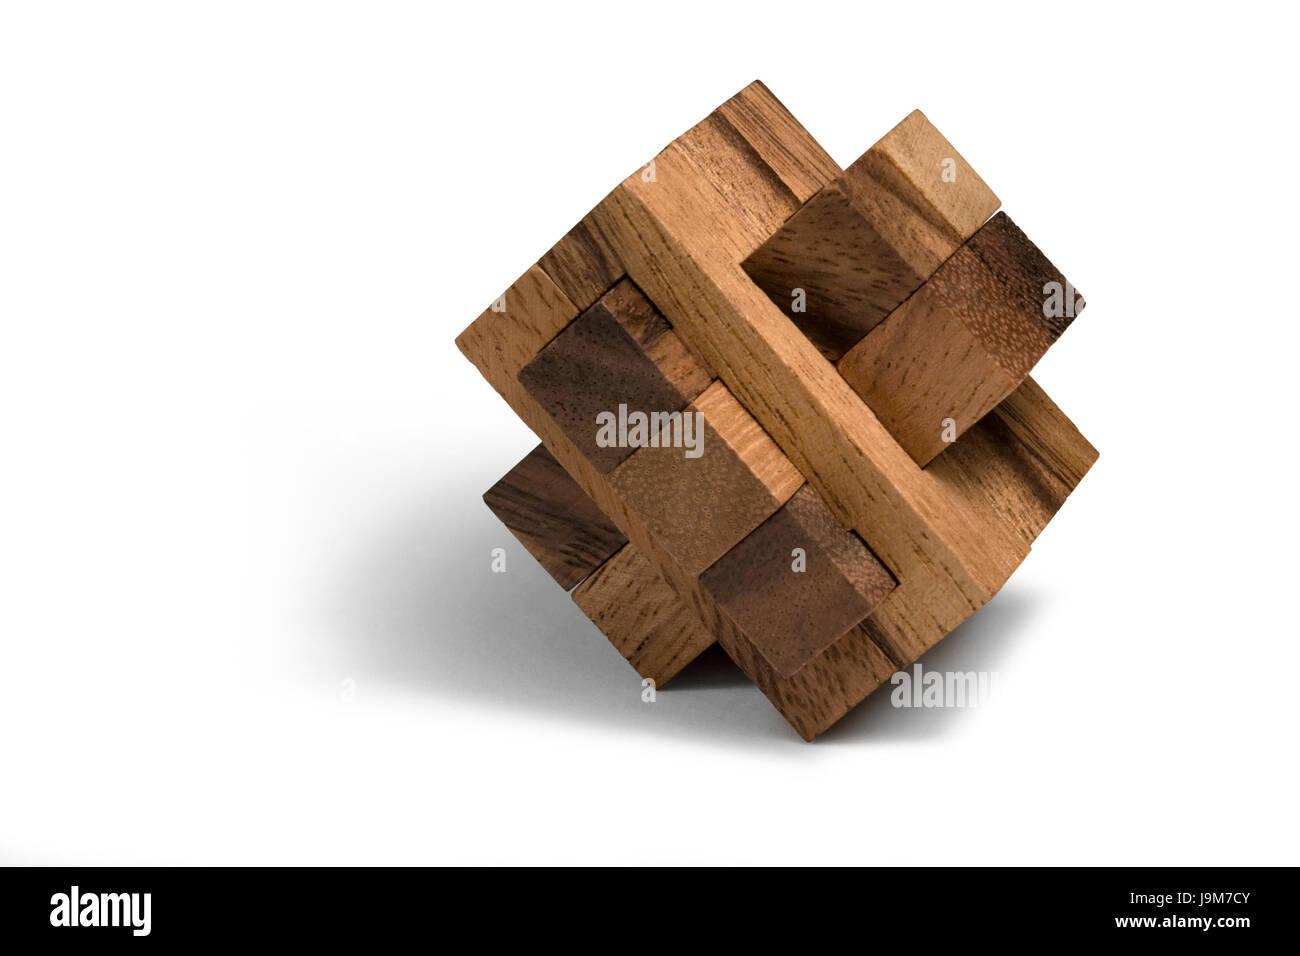 Mechanisches Puzzle Stock Photos & Mechanisches Puzzle Stock